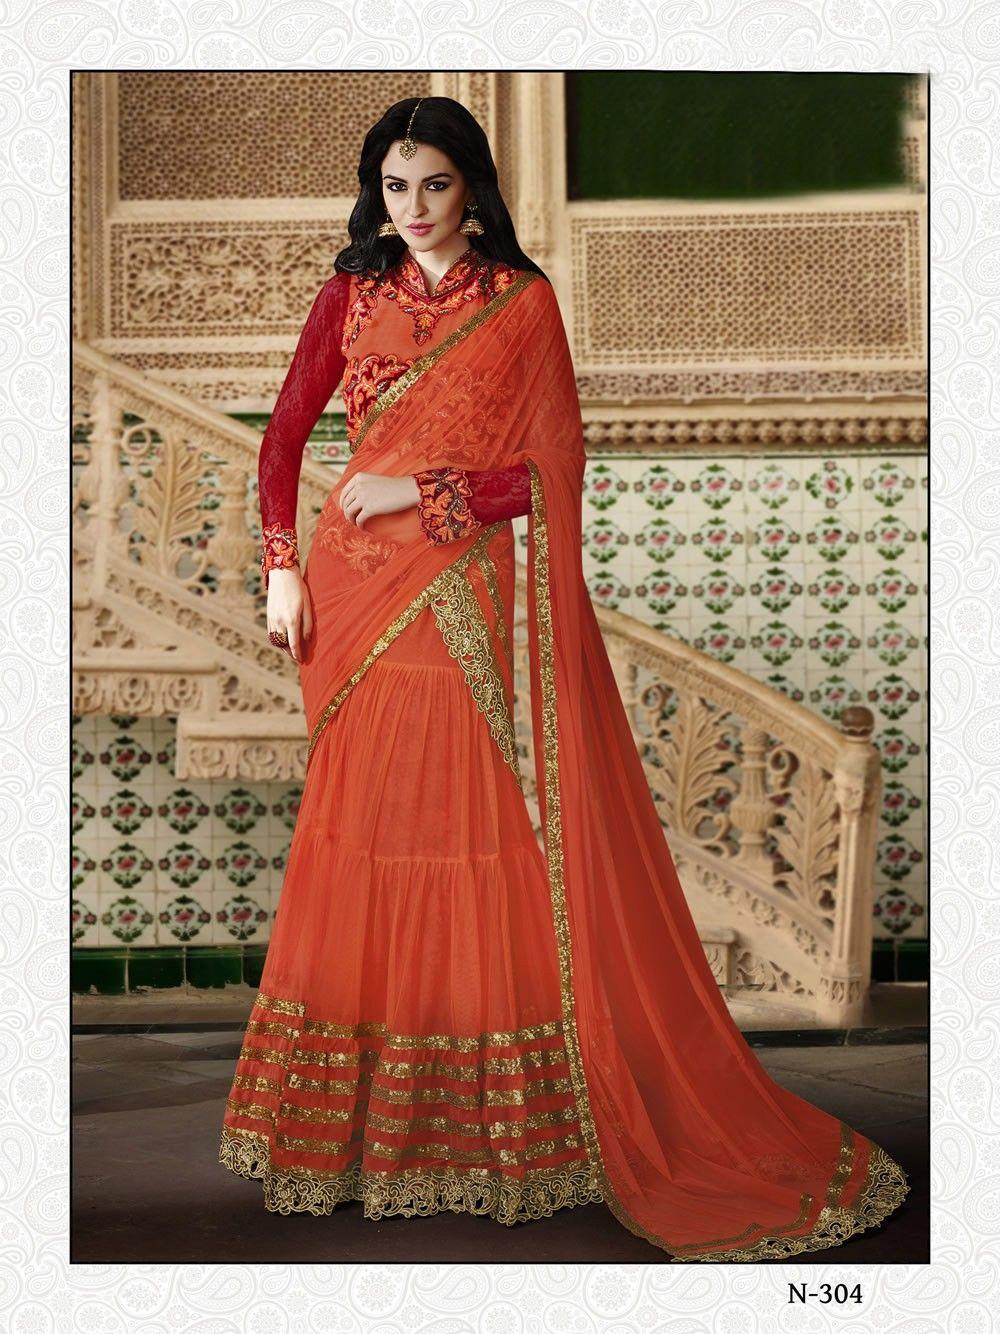 ef5e5930d4120 buy saree online Rust Colour Net Designer Wedding Wear Lehenga Choli Buy  Saree online UK - Buy Sarees online